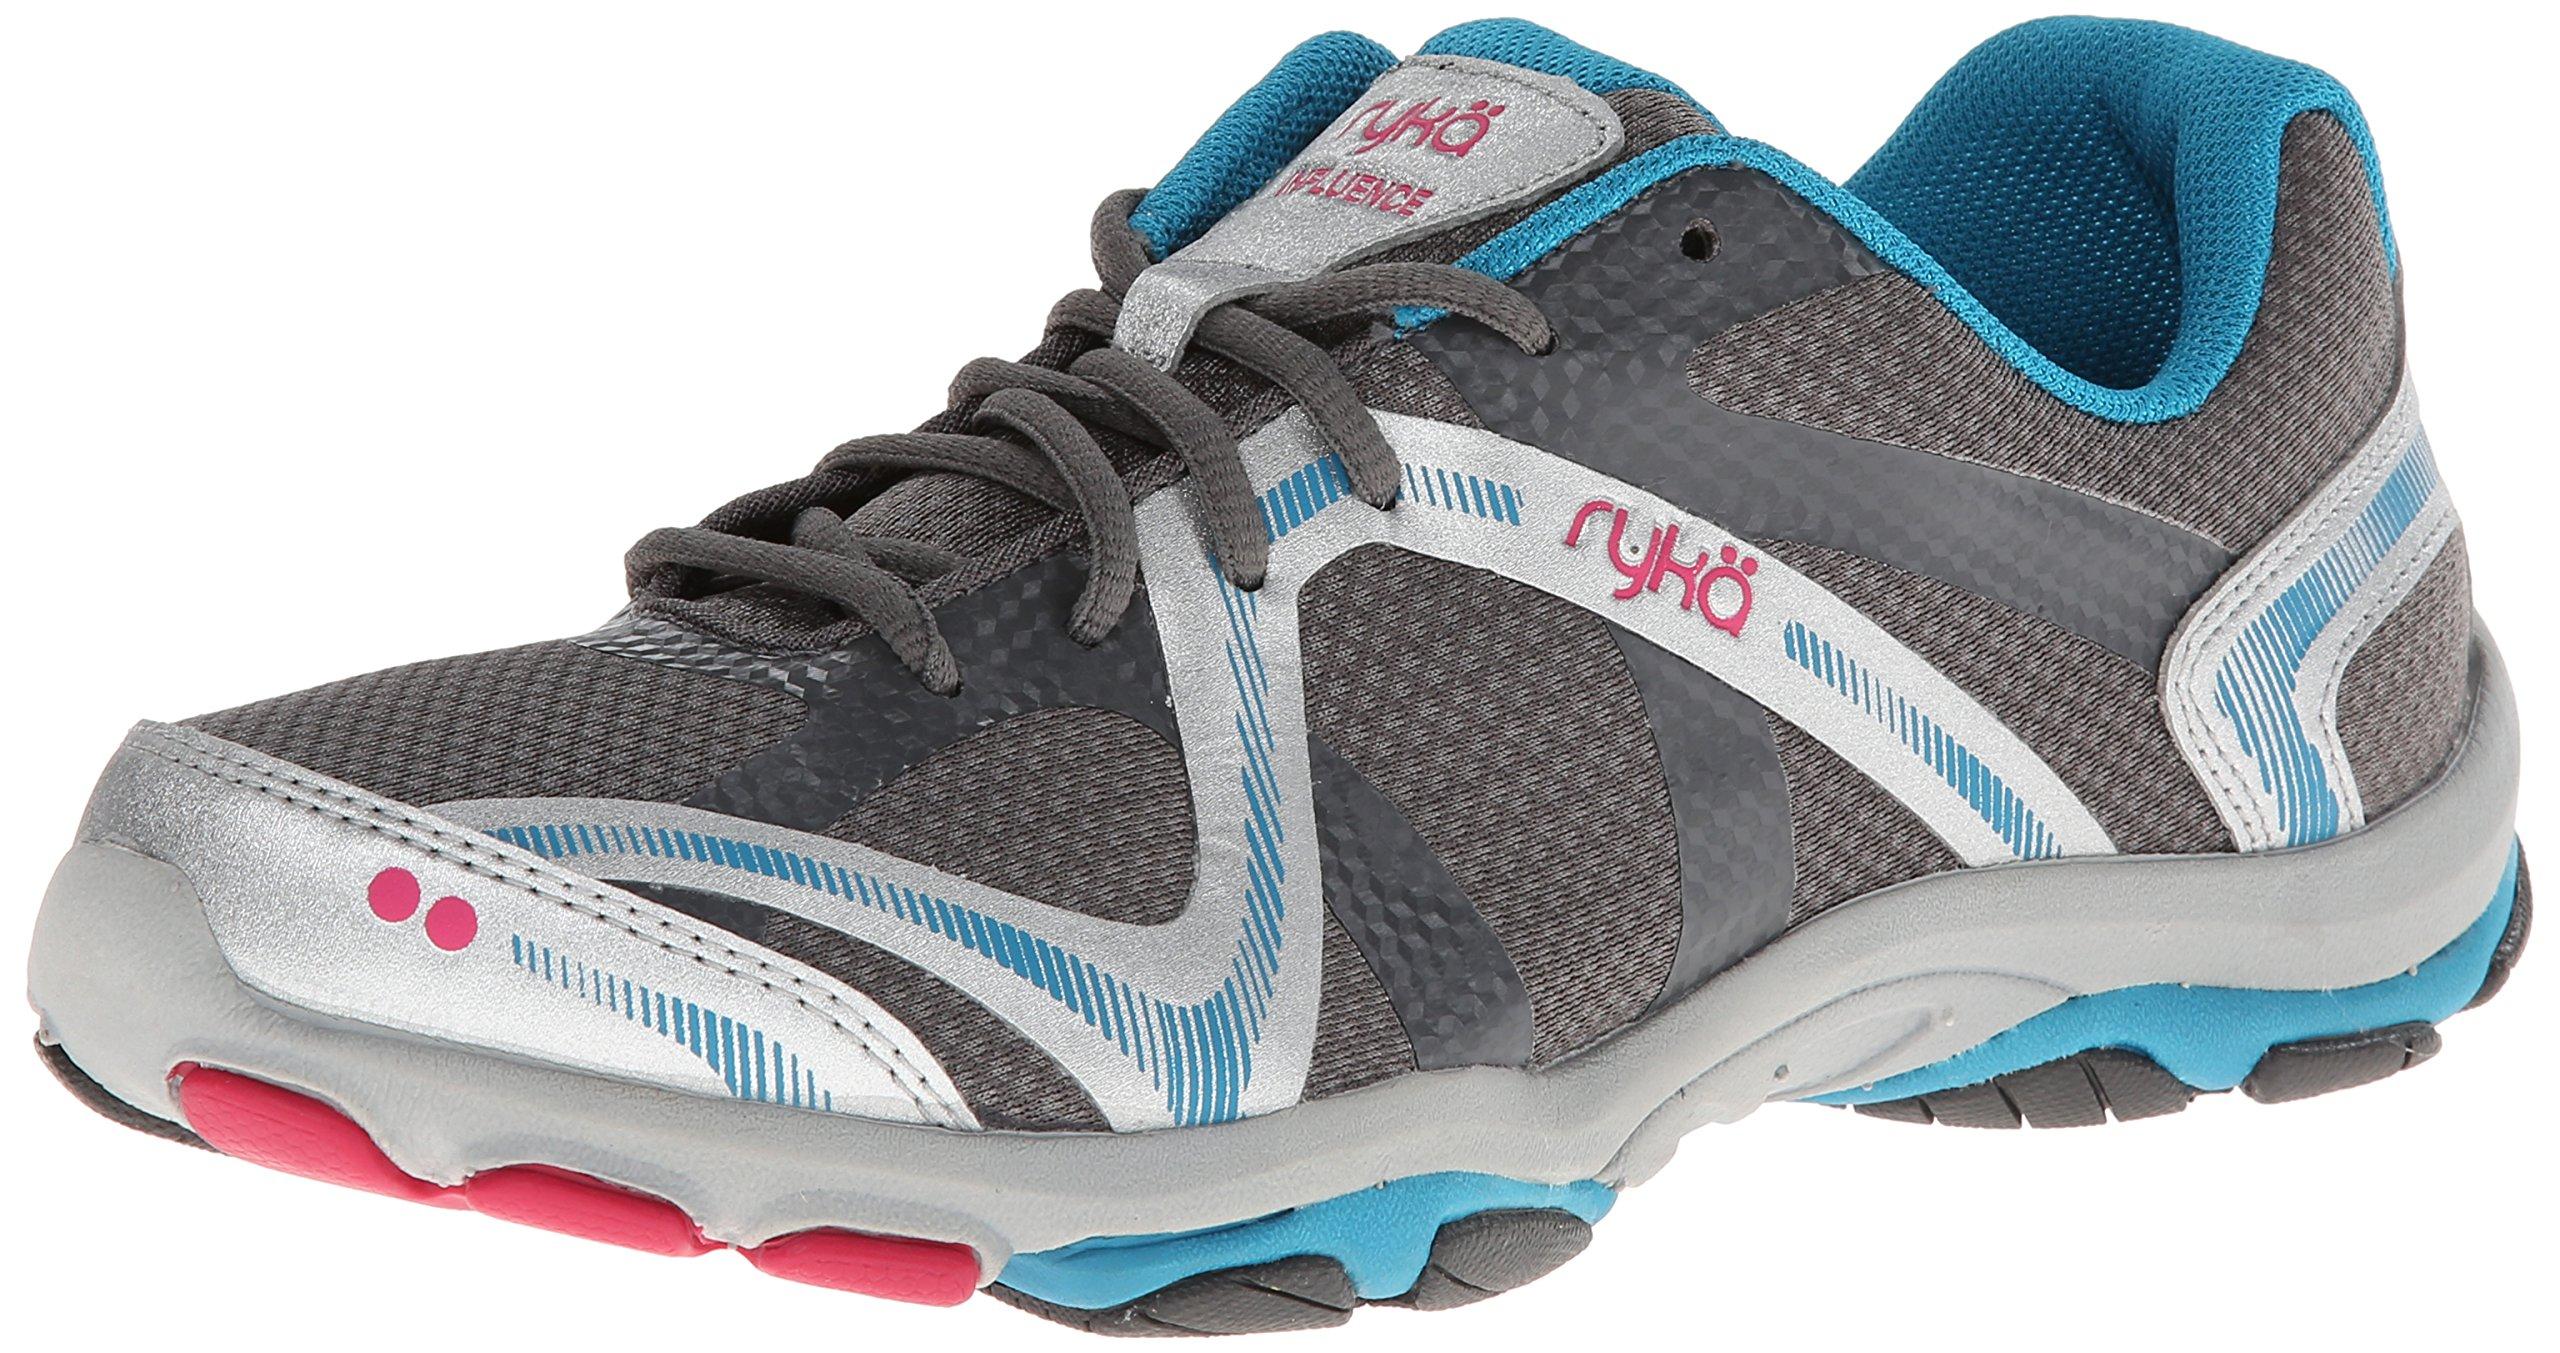 RYKA Women's Influence Cross Training Shoe, Steel Grey/Chrome Silver/Diver Blue/Zuma Pink, 8 M US by Ryka